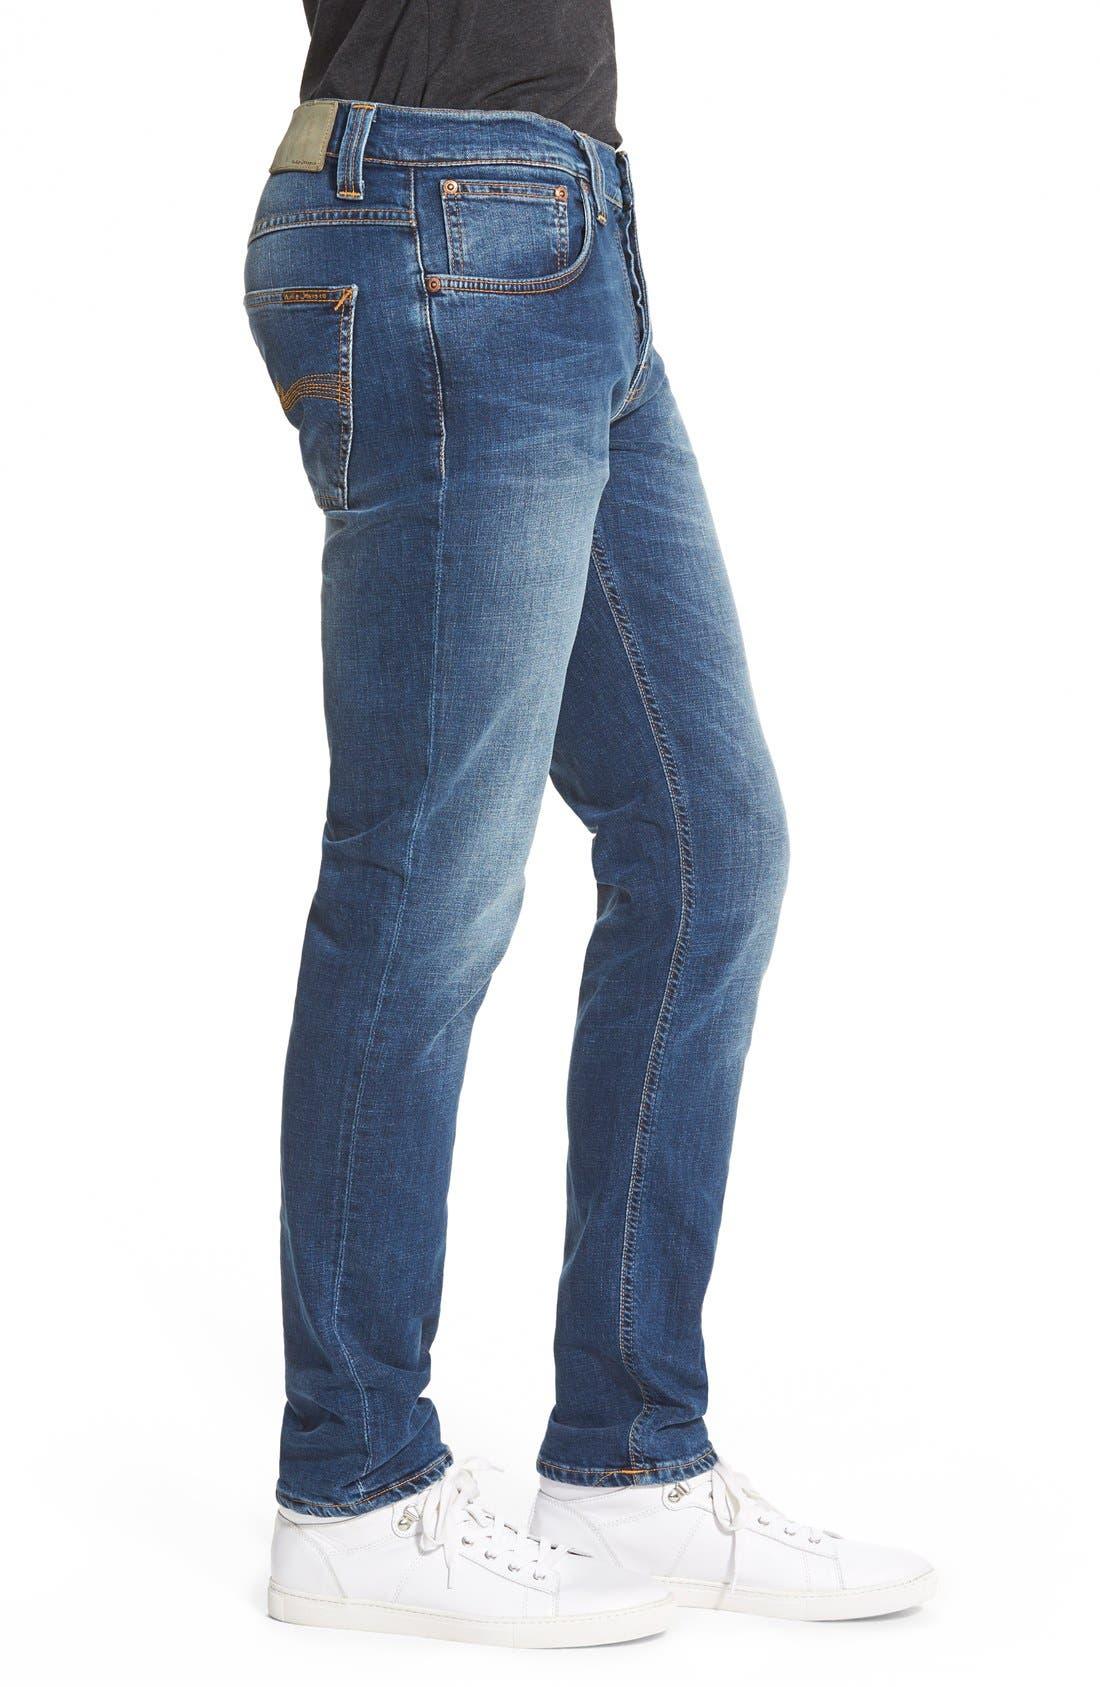 NUDIE JEANS,                             'Grim Tim' Slim Fit Stretch Organic Cotton Jeans,                             Alternate thumbnail 2, color,                             462